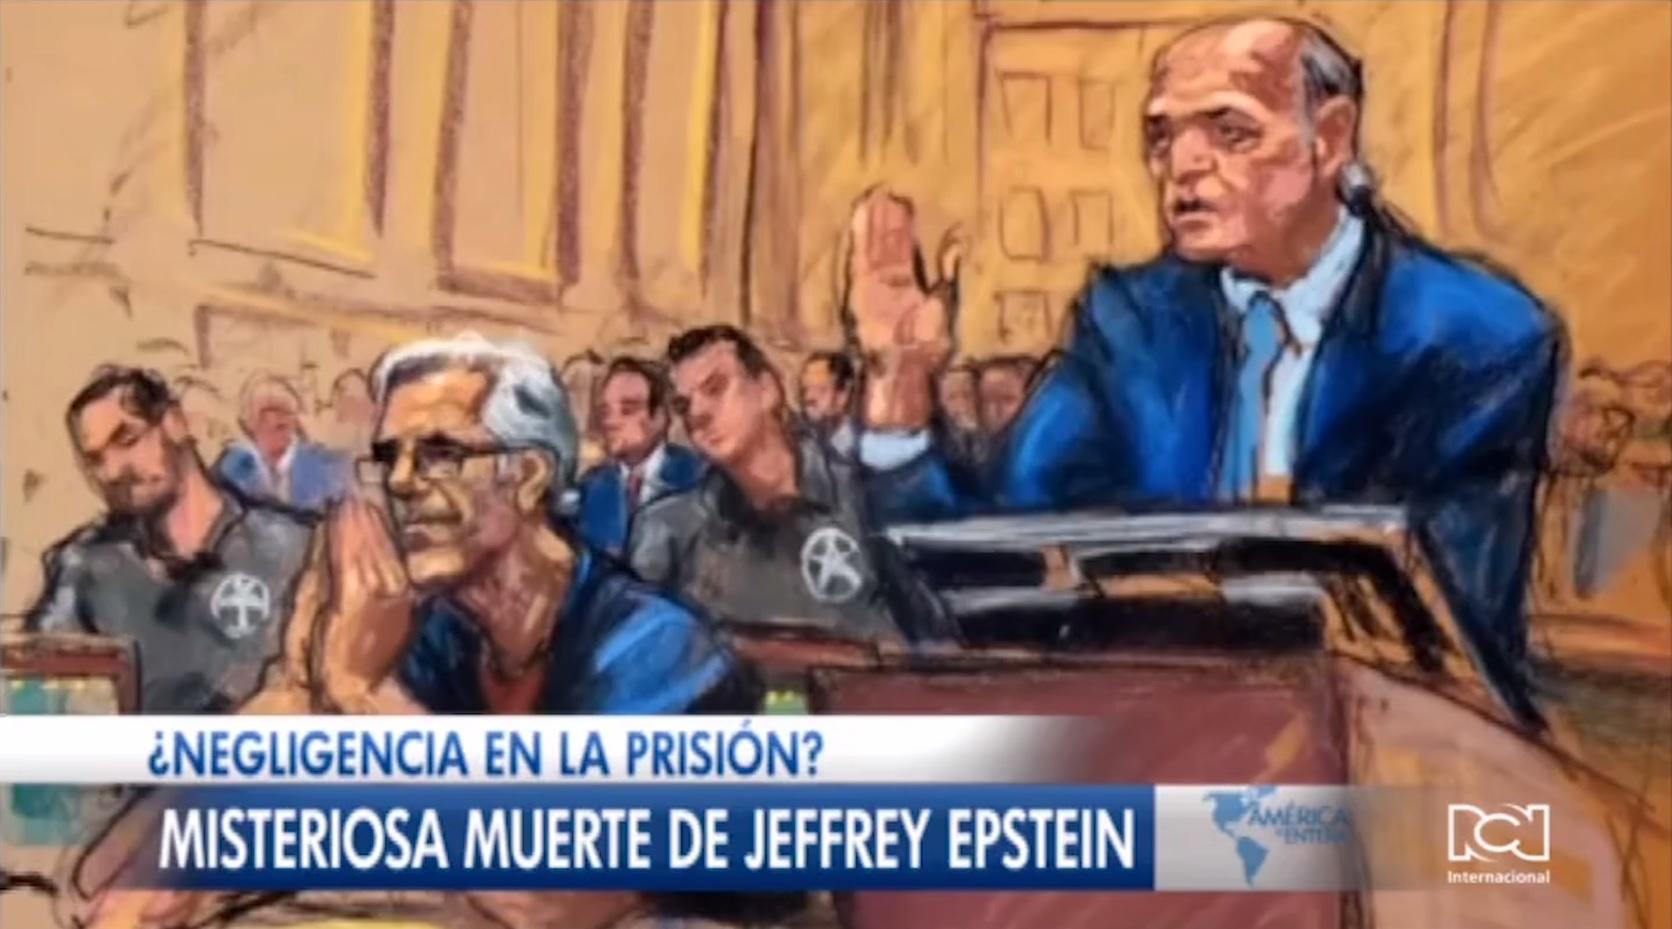 Misteriosa muerte de Jeffrey Epstein